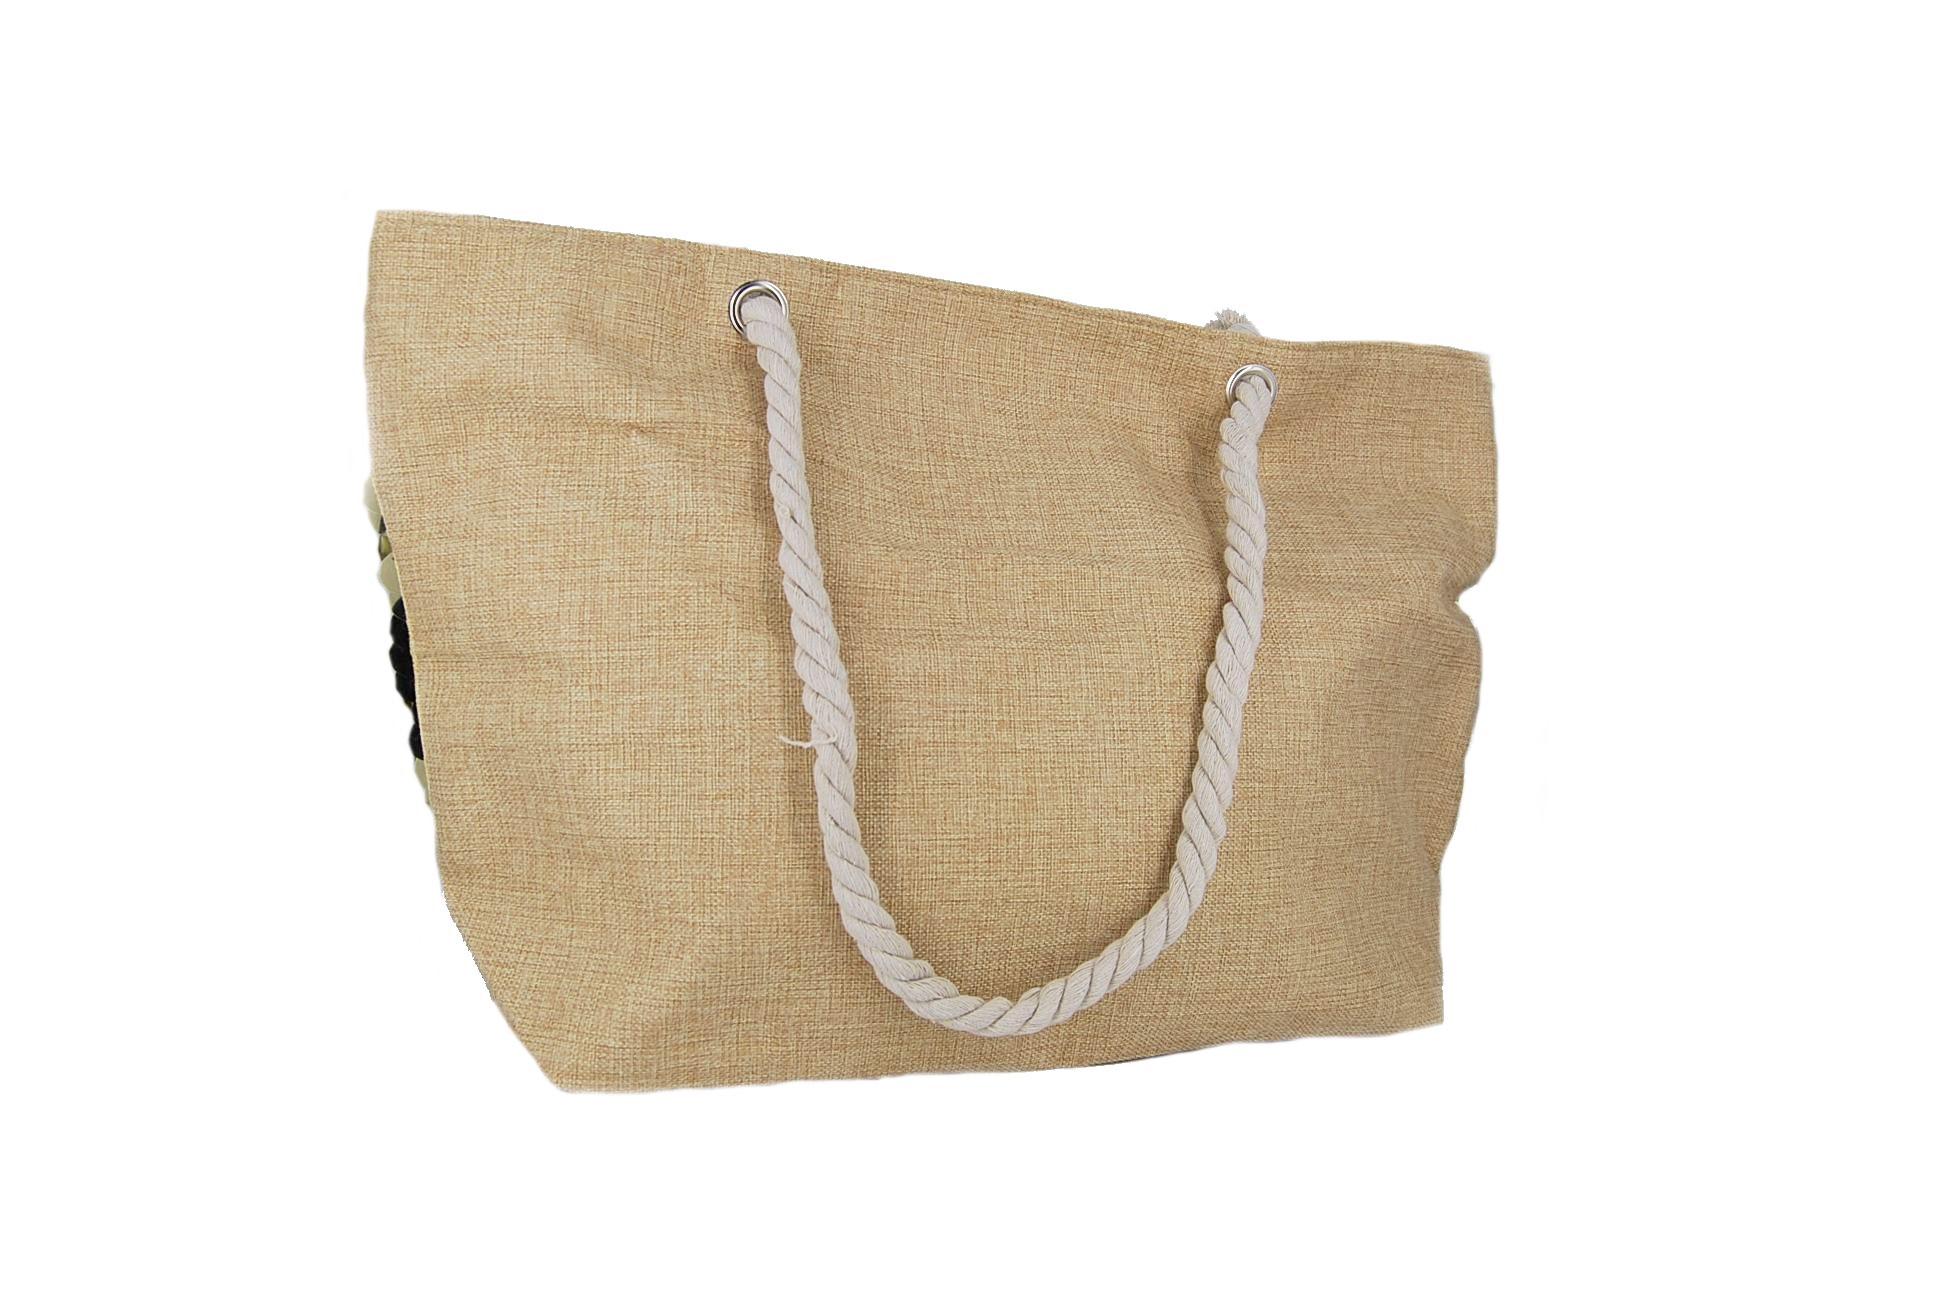 b82c9c0763 Doca τσάντα θαλάσσης γυναικεία χρυσές πούλιες